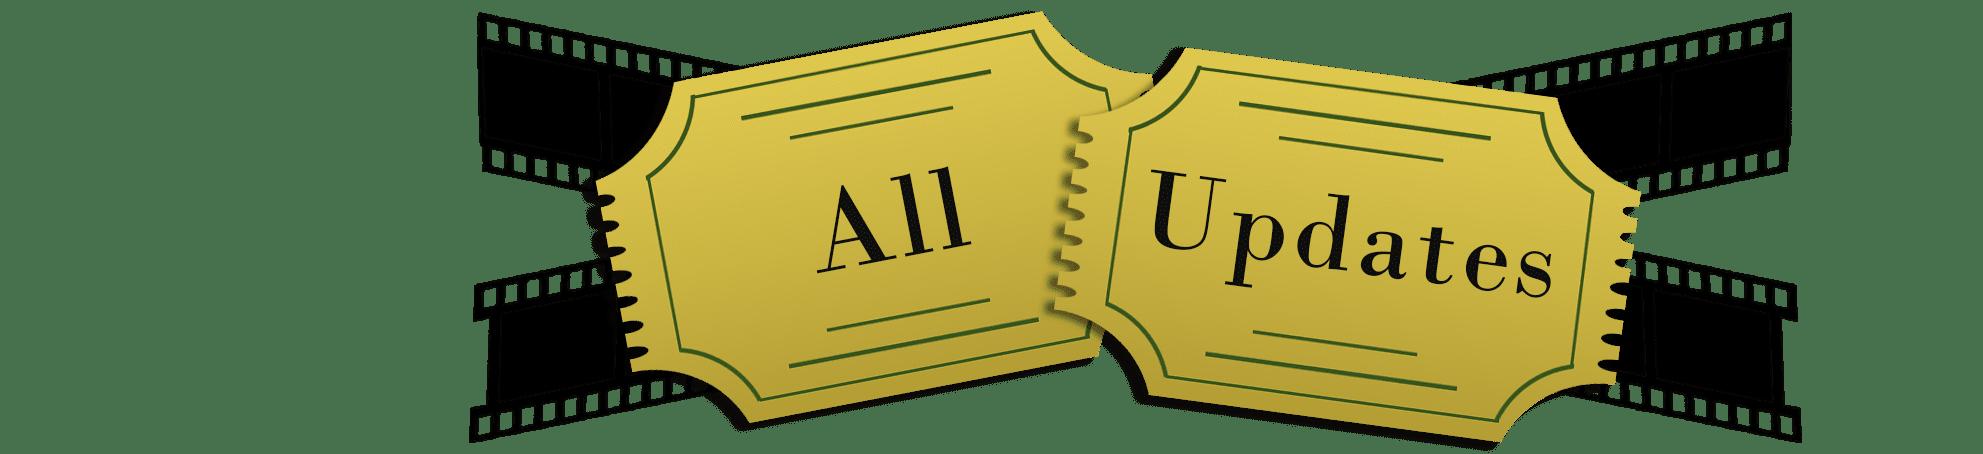 allupdates site